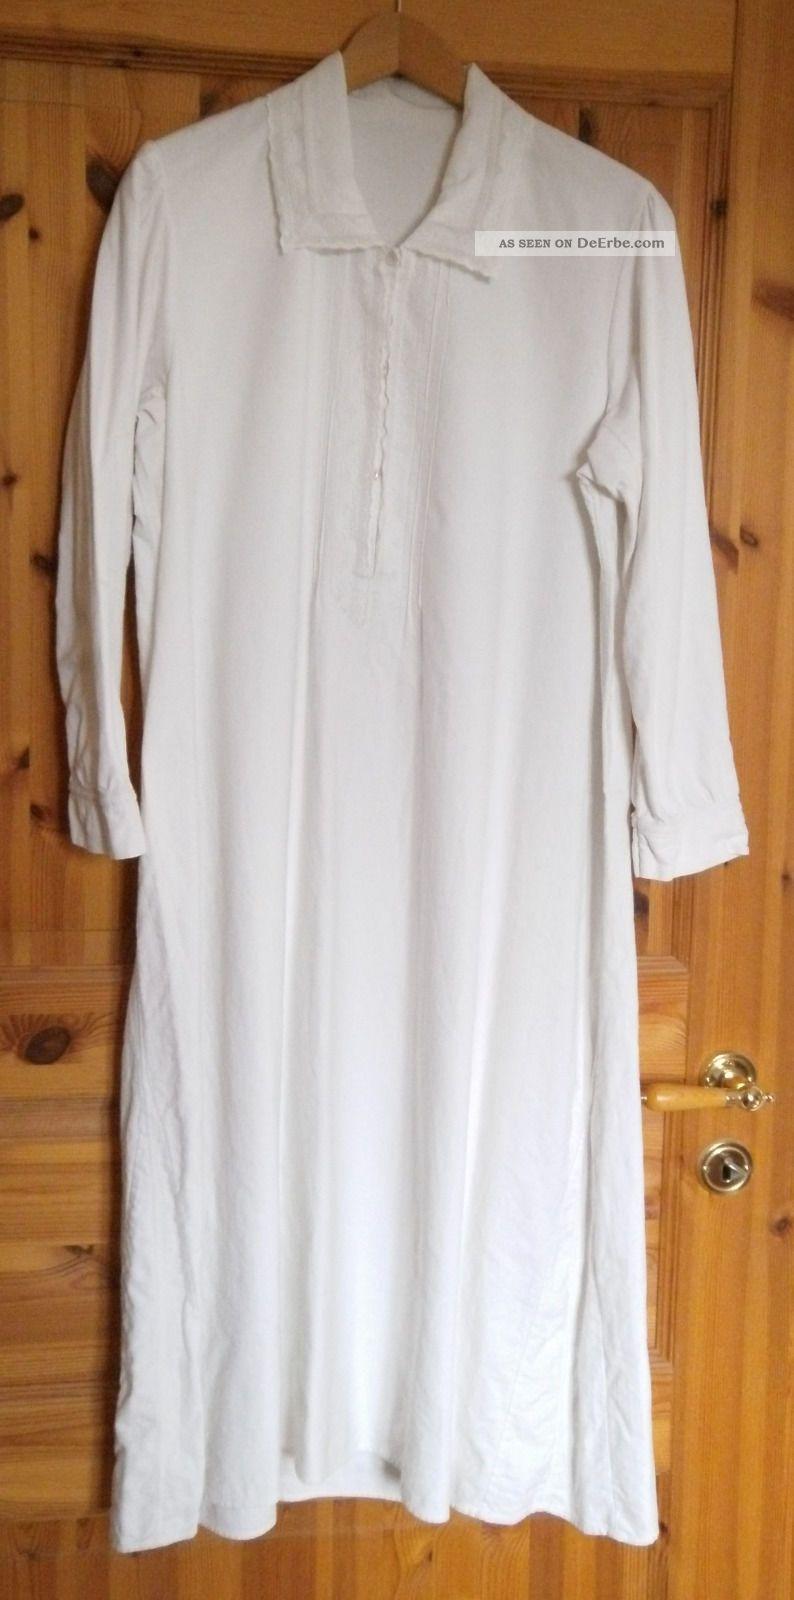 newest collection dd72f 10e94 Warmes Langes Nachthemd Mit Spitze, Gr. 40 - 42